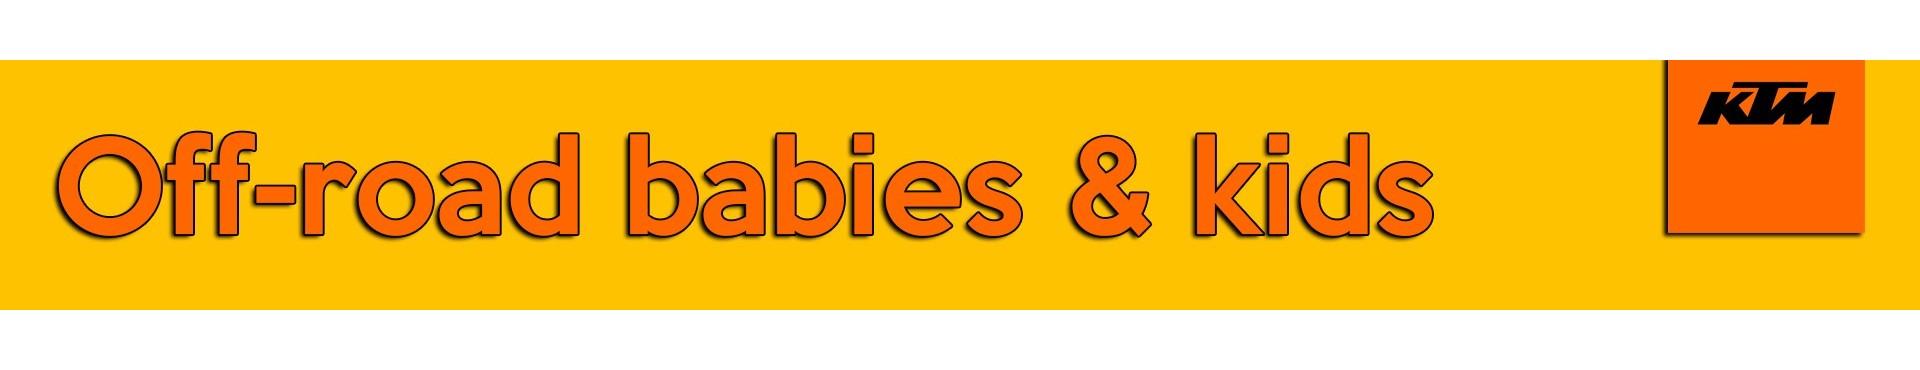 Kids + Babies